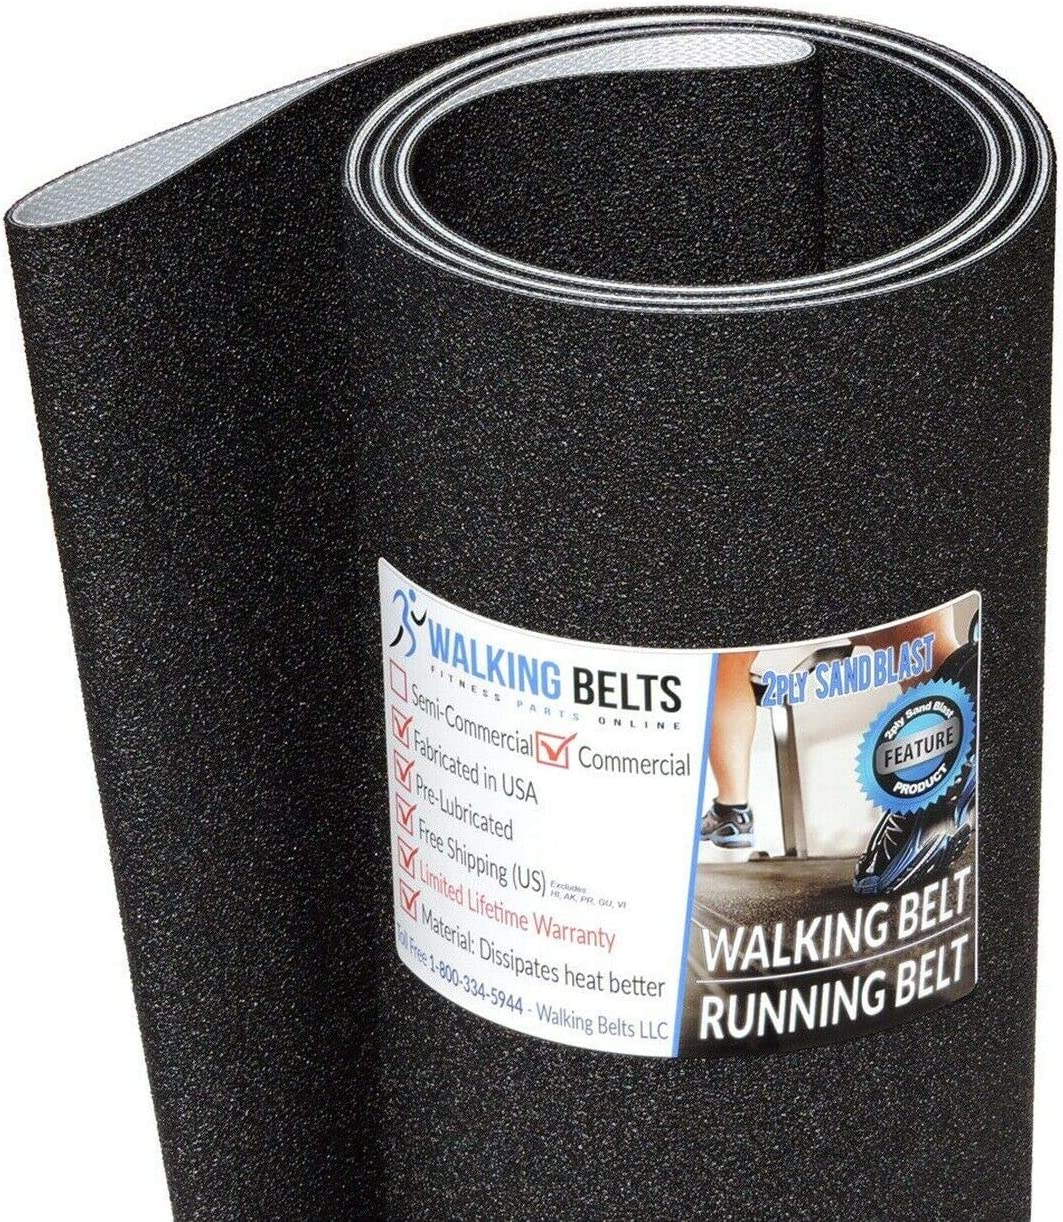 WALKINGBELTS Walking Belts LLC All items in the store - TV NT CENTL85023 Challenge the lowest price of Japan ☆ 9600 Internati